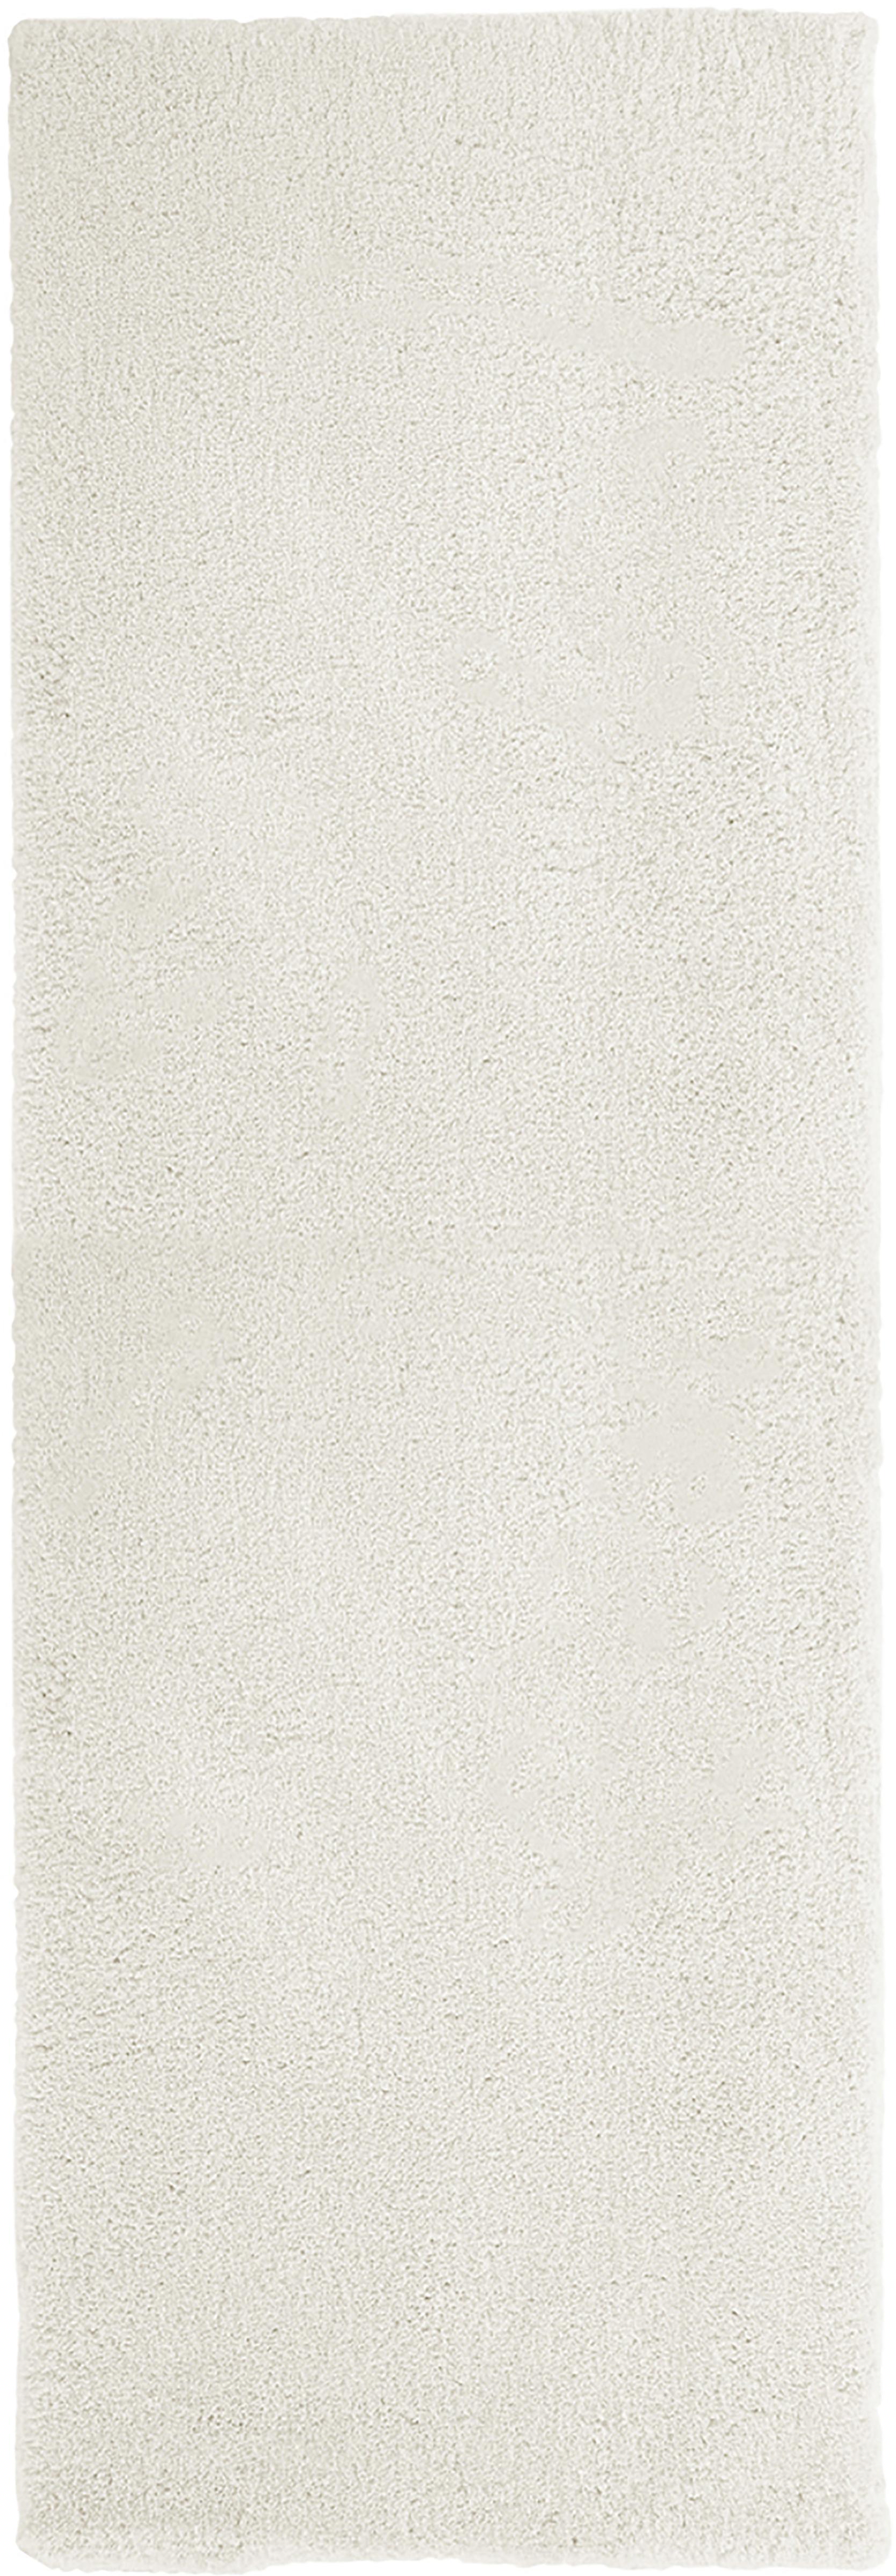 Passatoia pelosa morbida color crema Leighton, Retro: 70% poliestere, 30% coton, Crema, Larg. 80 x Lung. 250 cm